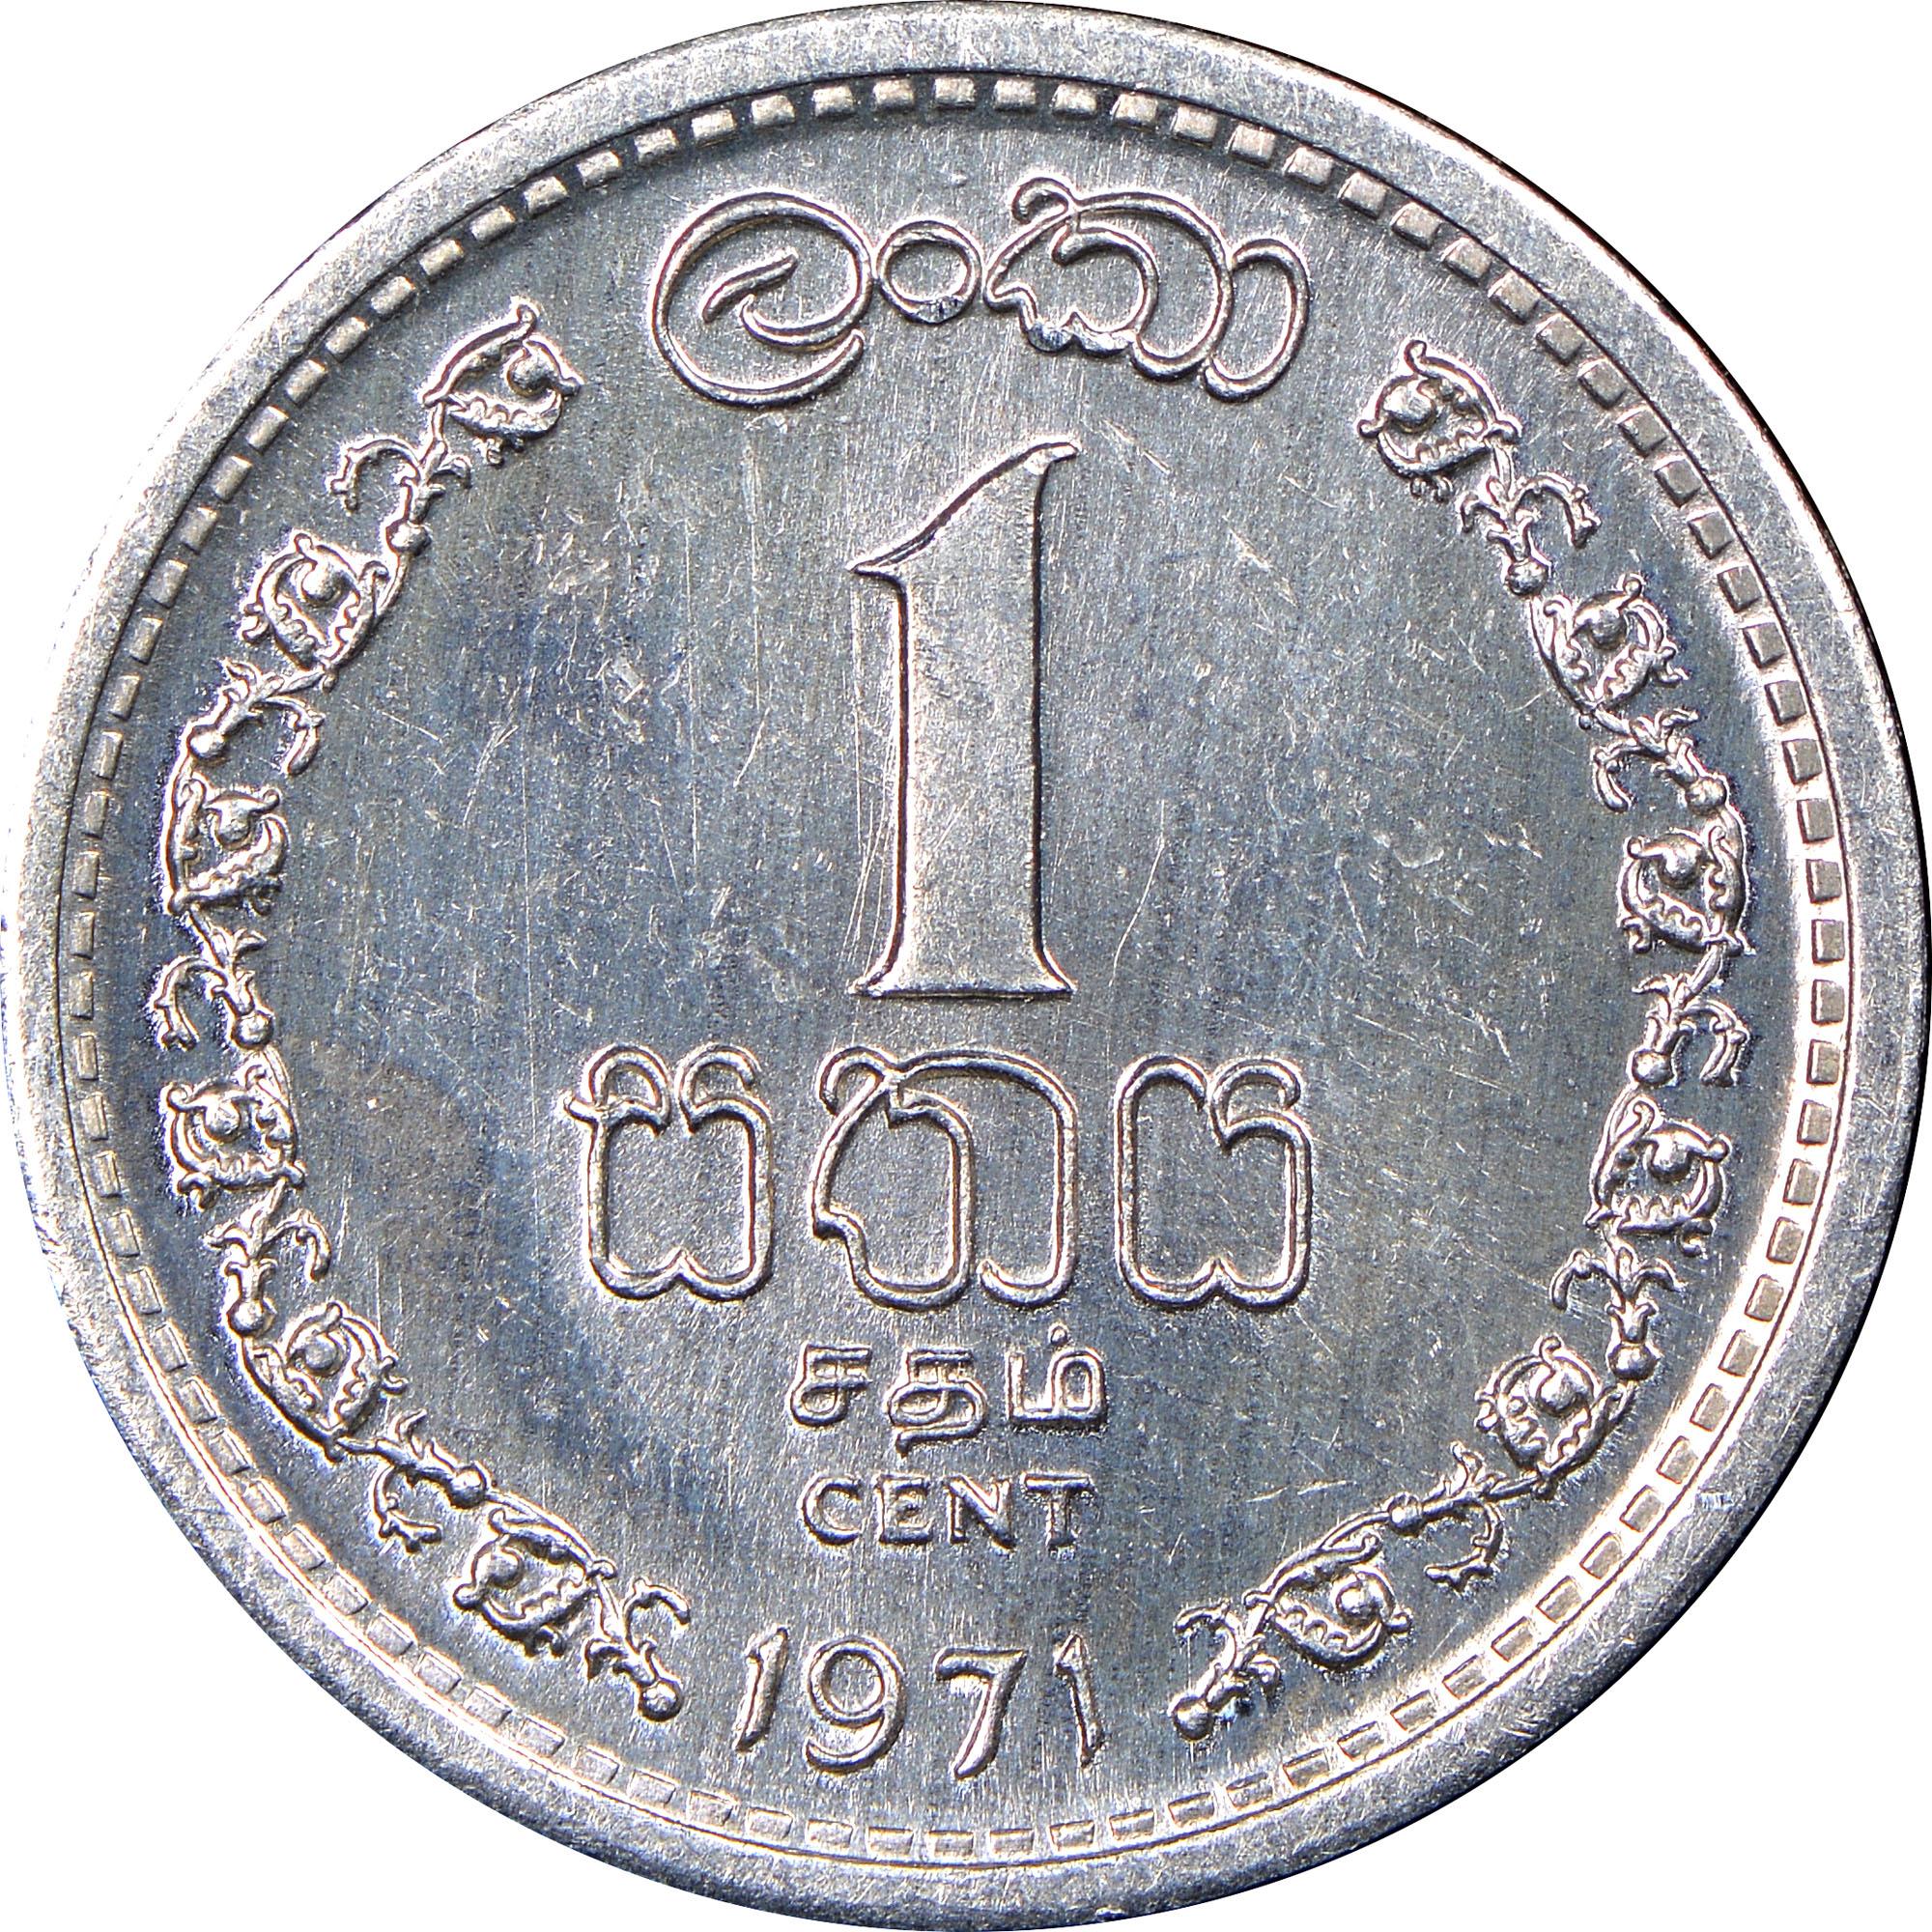 Ceylon Cent obverse